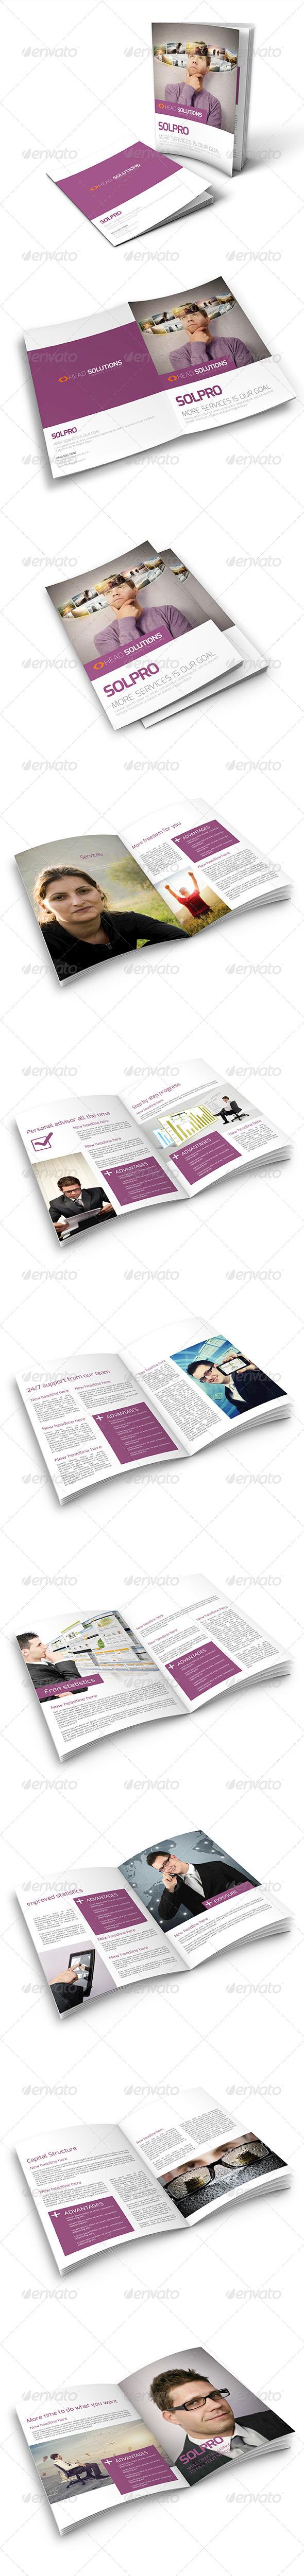 Clean Corporate Service Brochure - Corporate Brochures